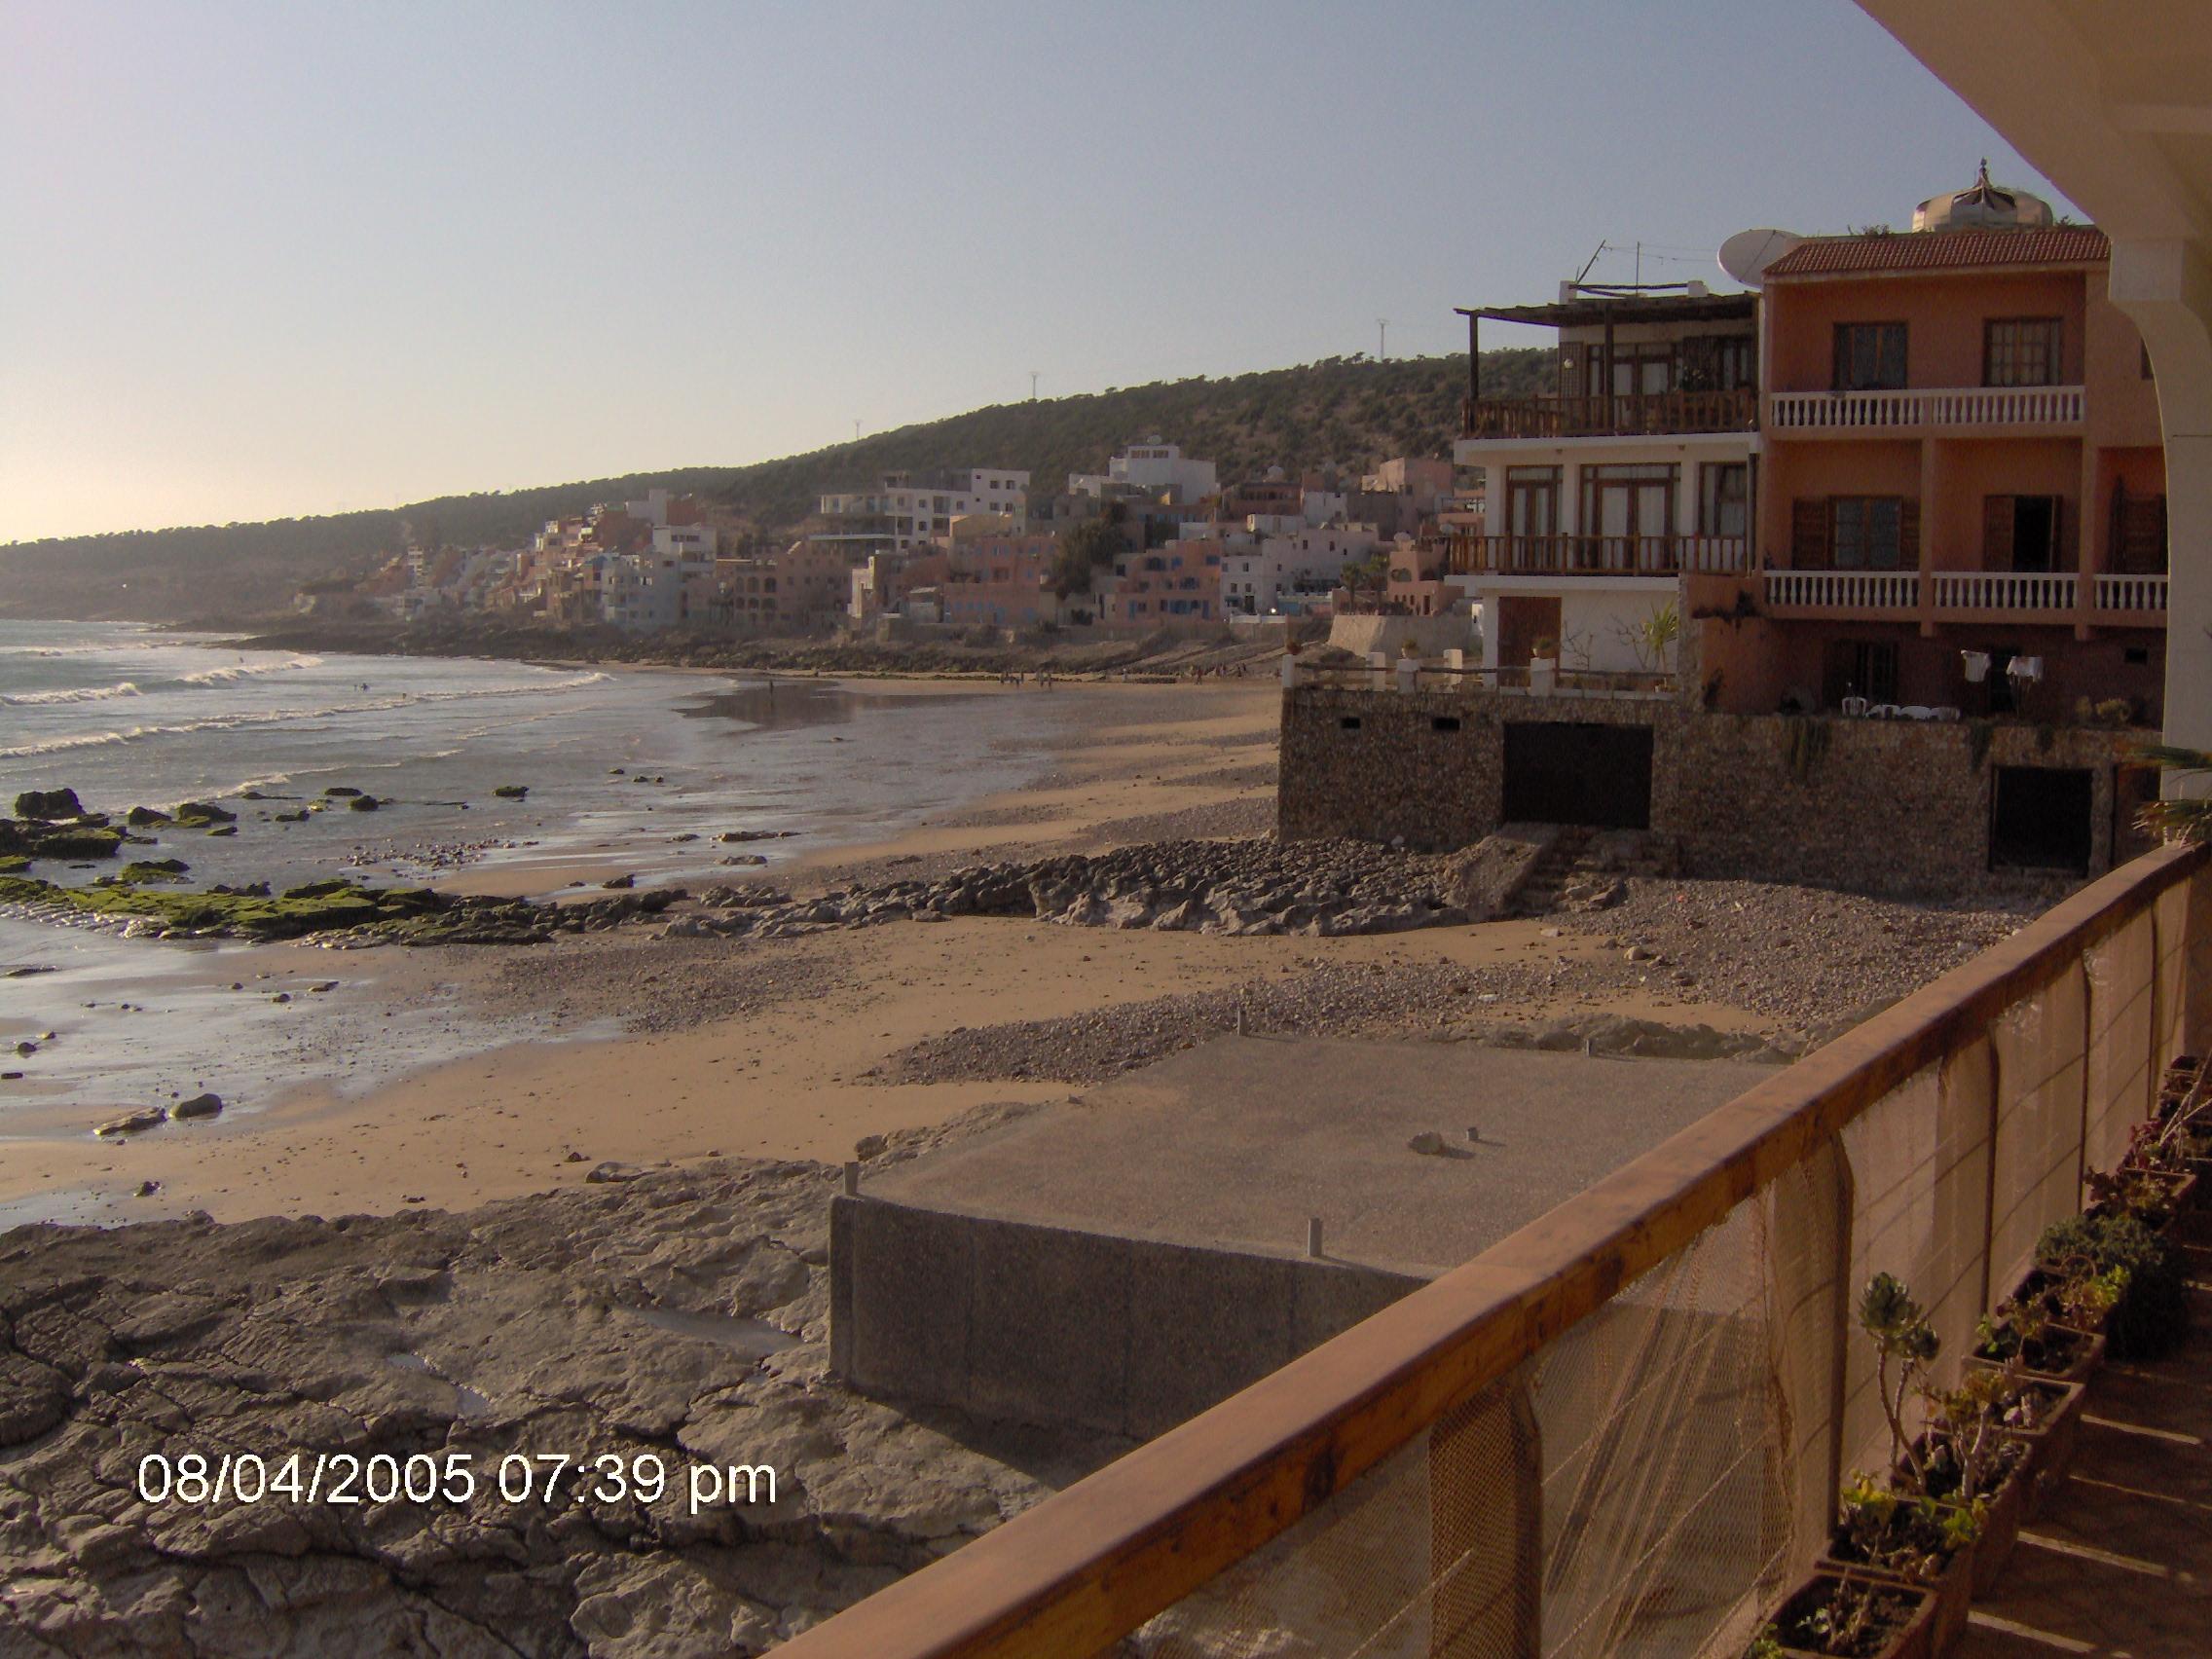 Verkoop 3 slaapkamers taghazout agadir marokko beach front - Slaapkamer marokko ...